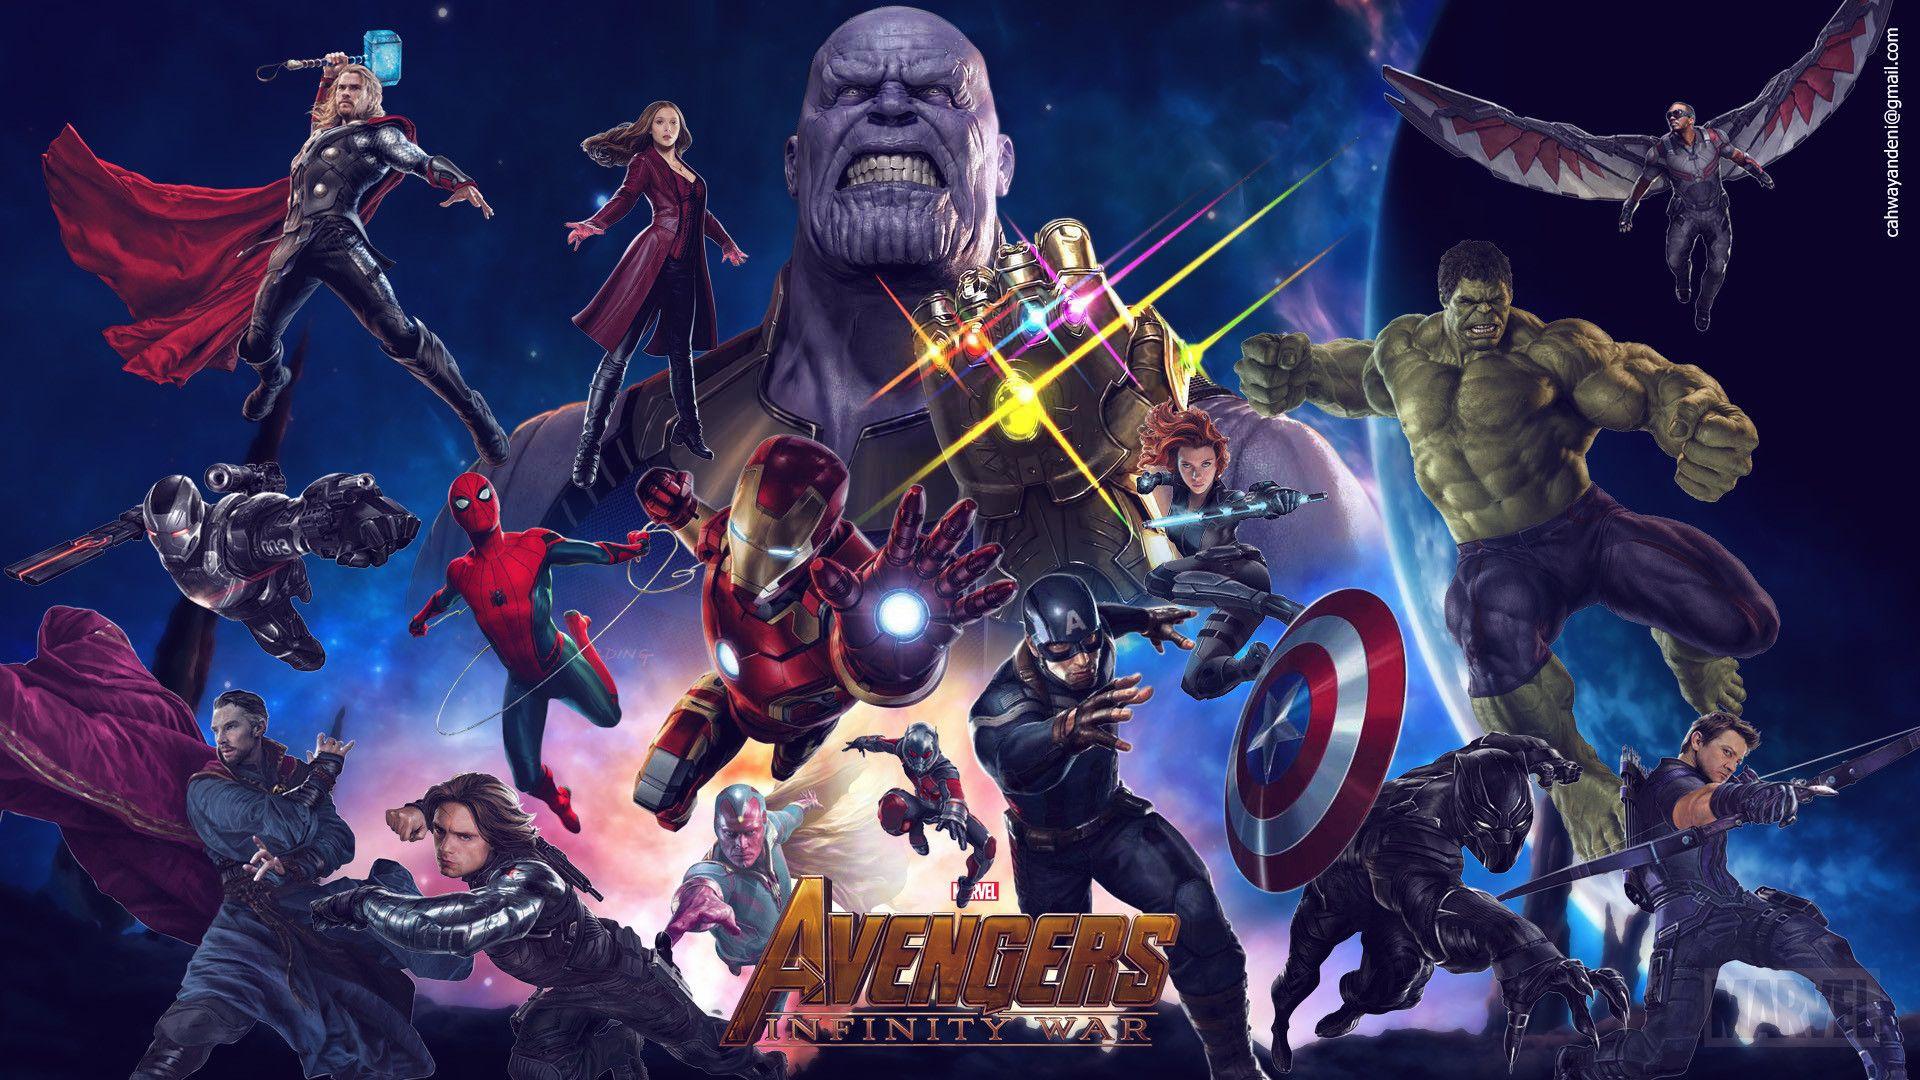 Marvel Future Fight Hd Wallpaper 8 1920 X 1080 Stmed Net Avengers Infinity War Avengers Wallpaper Avengers